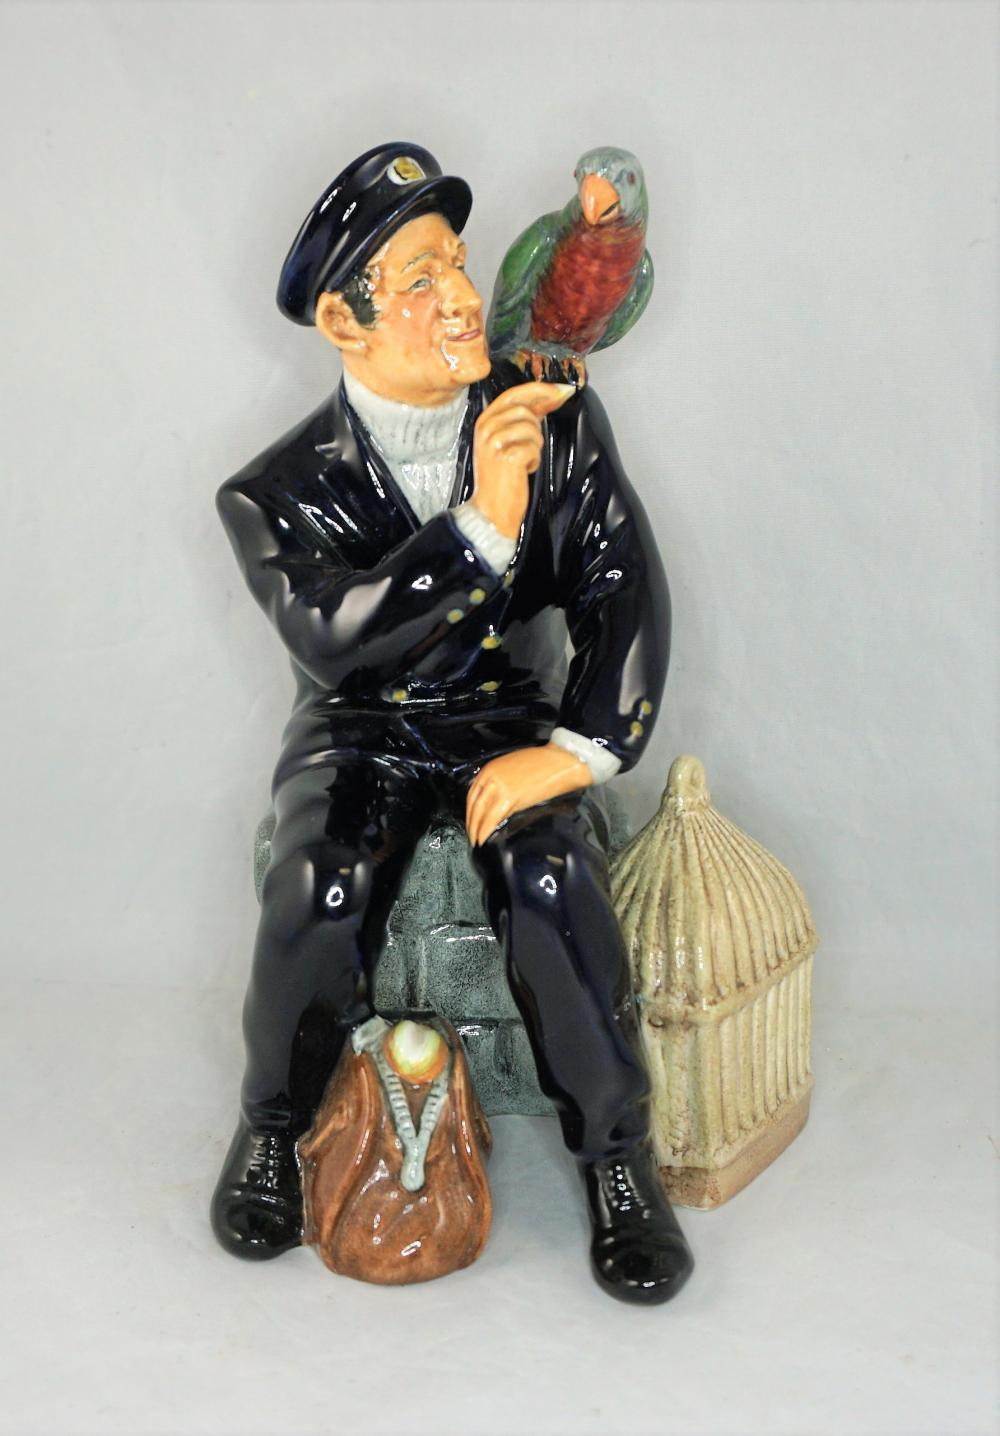 Royal Doulton Shore Leave figurine